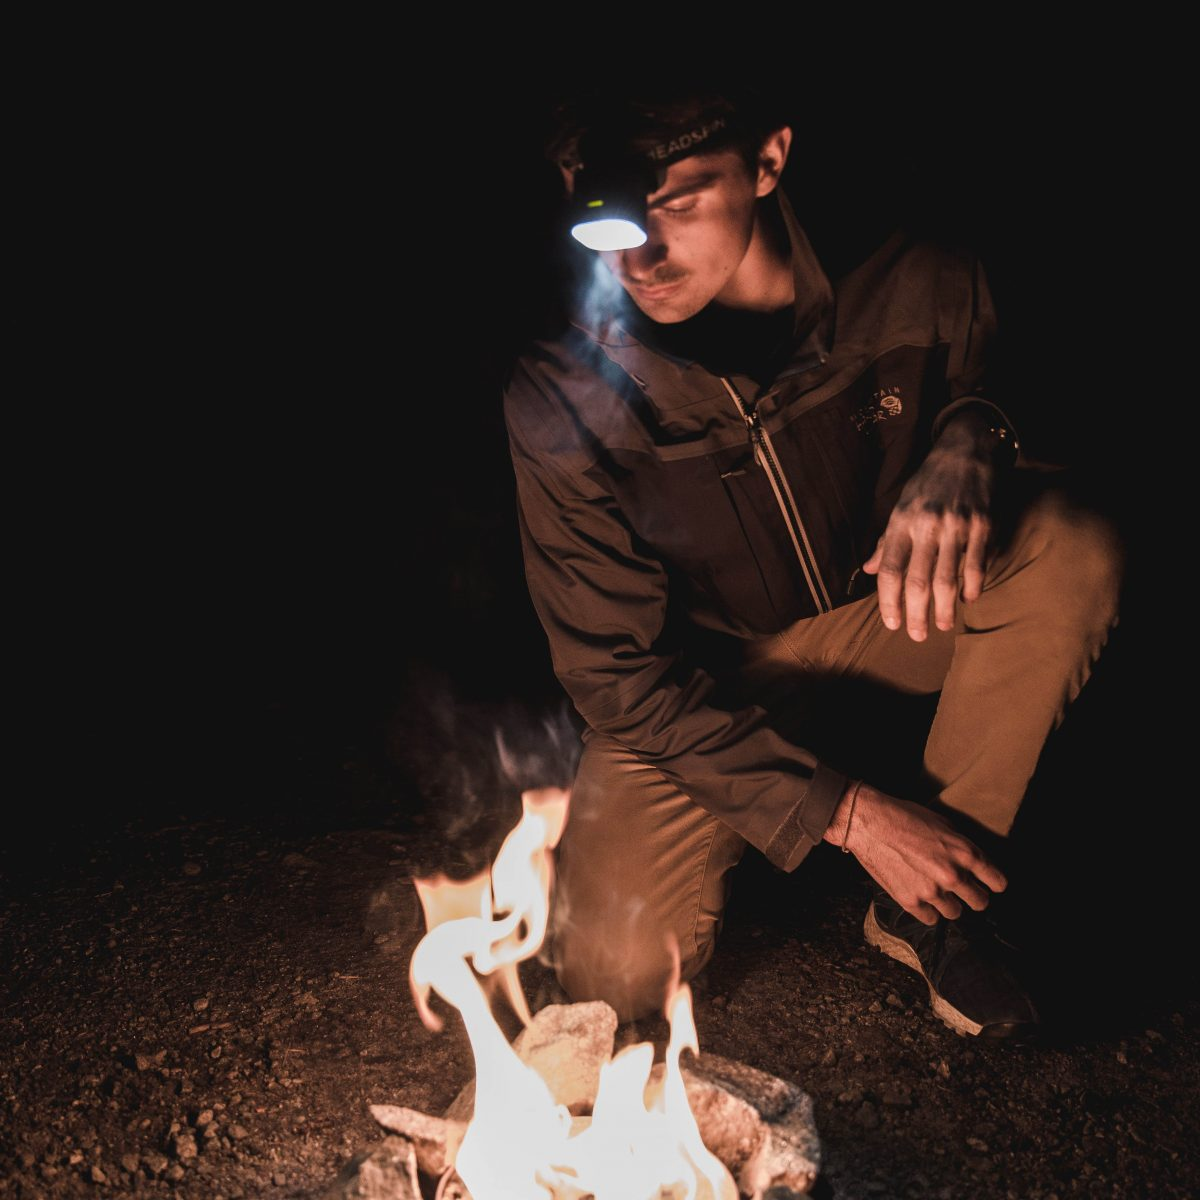 headpsin campfire